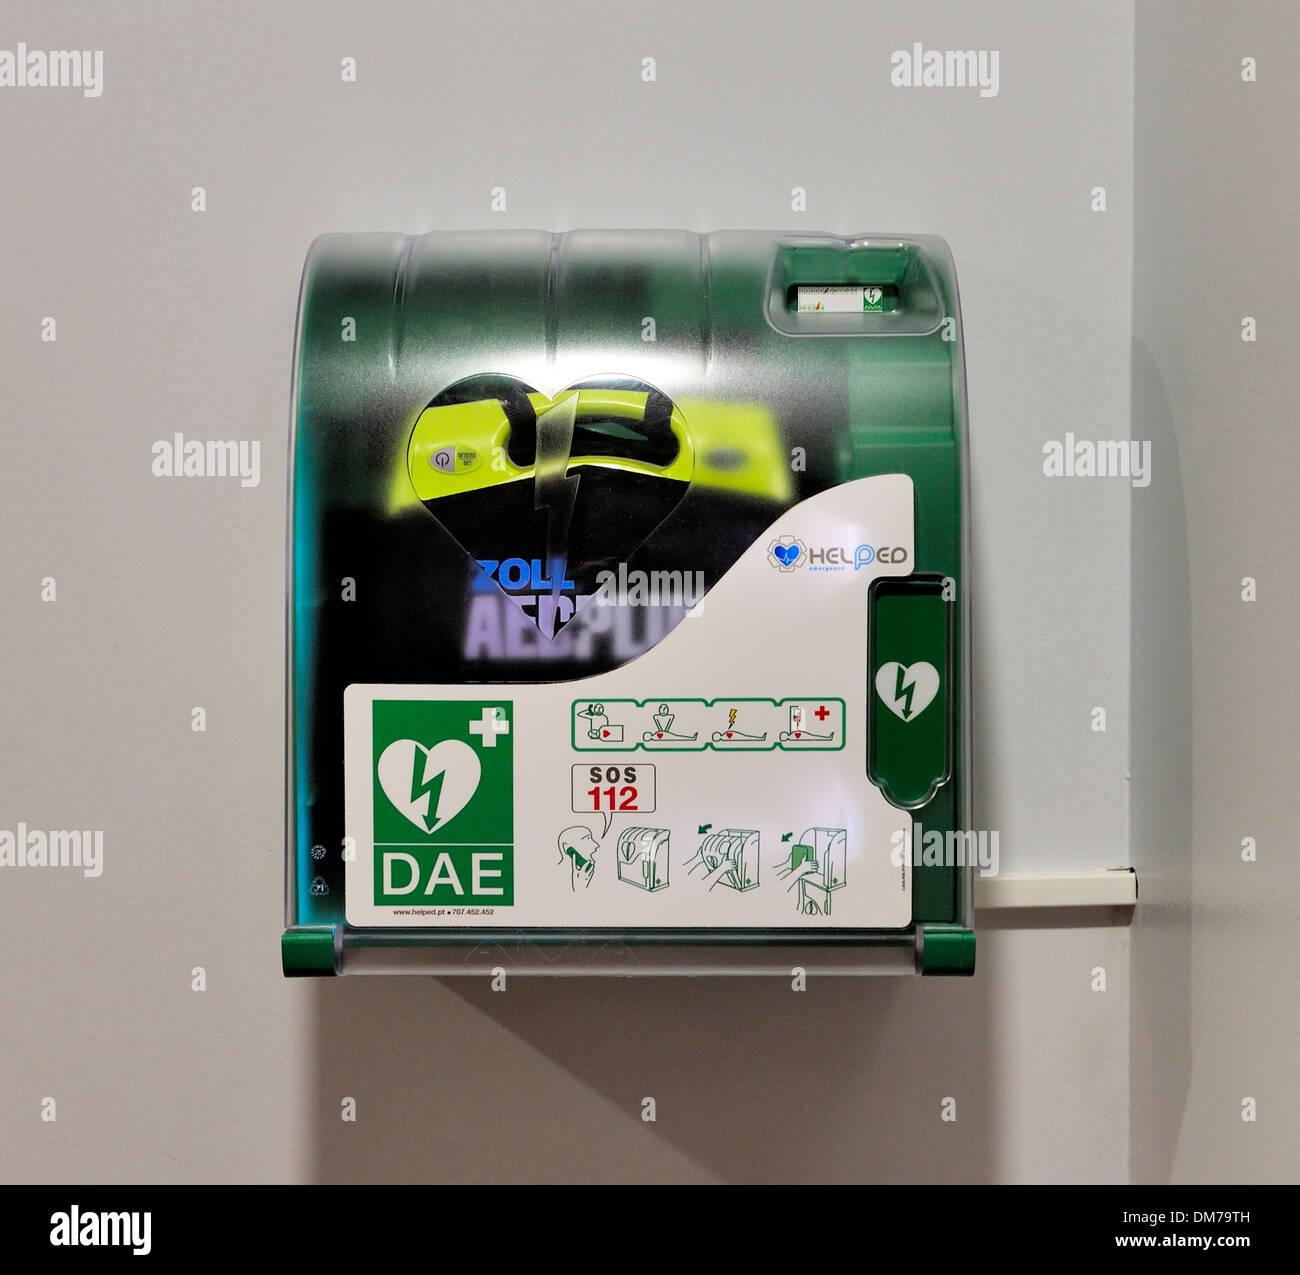 A ZOLL Medical defibrillator - Stock Image